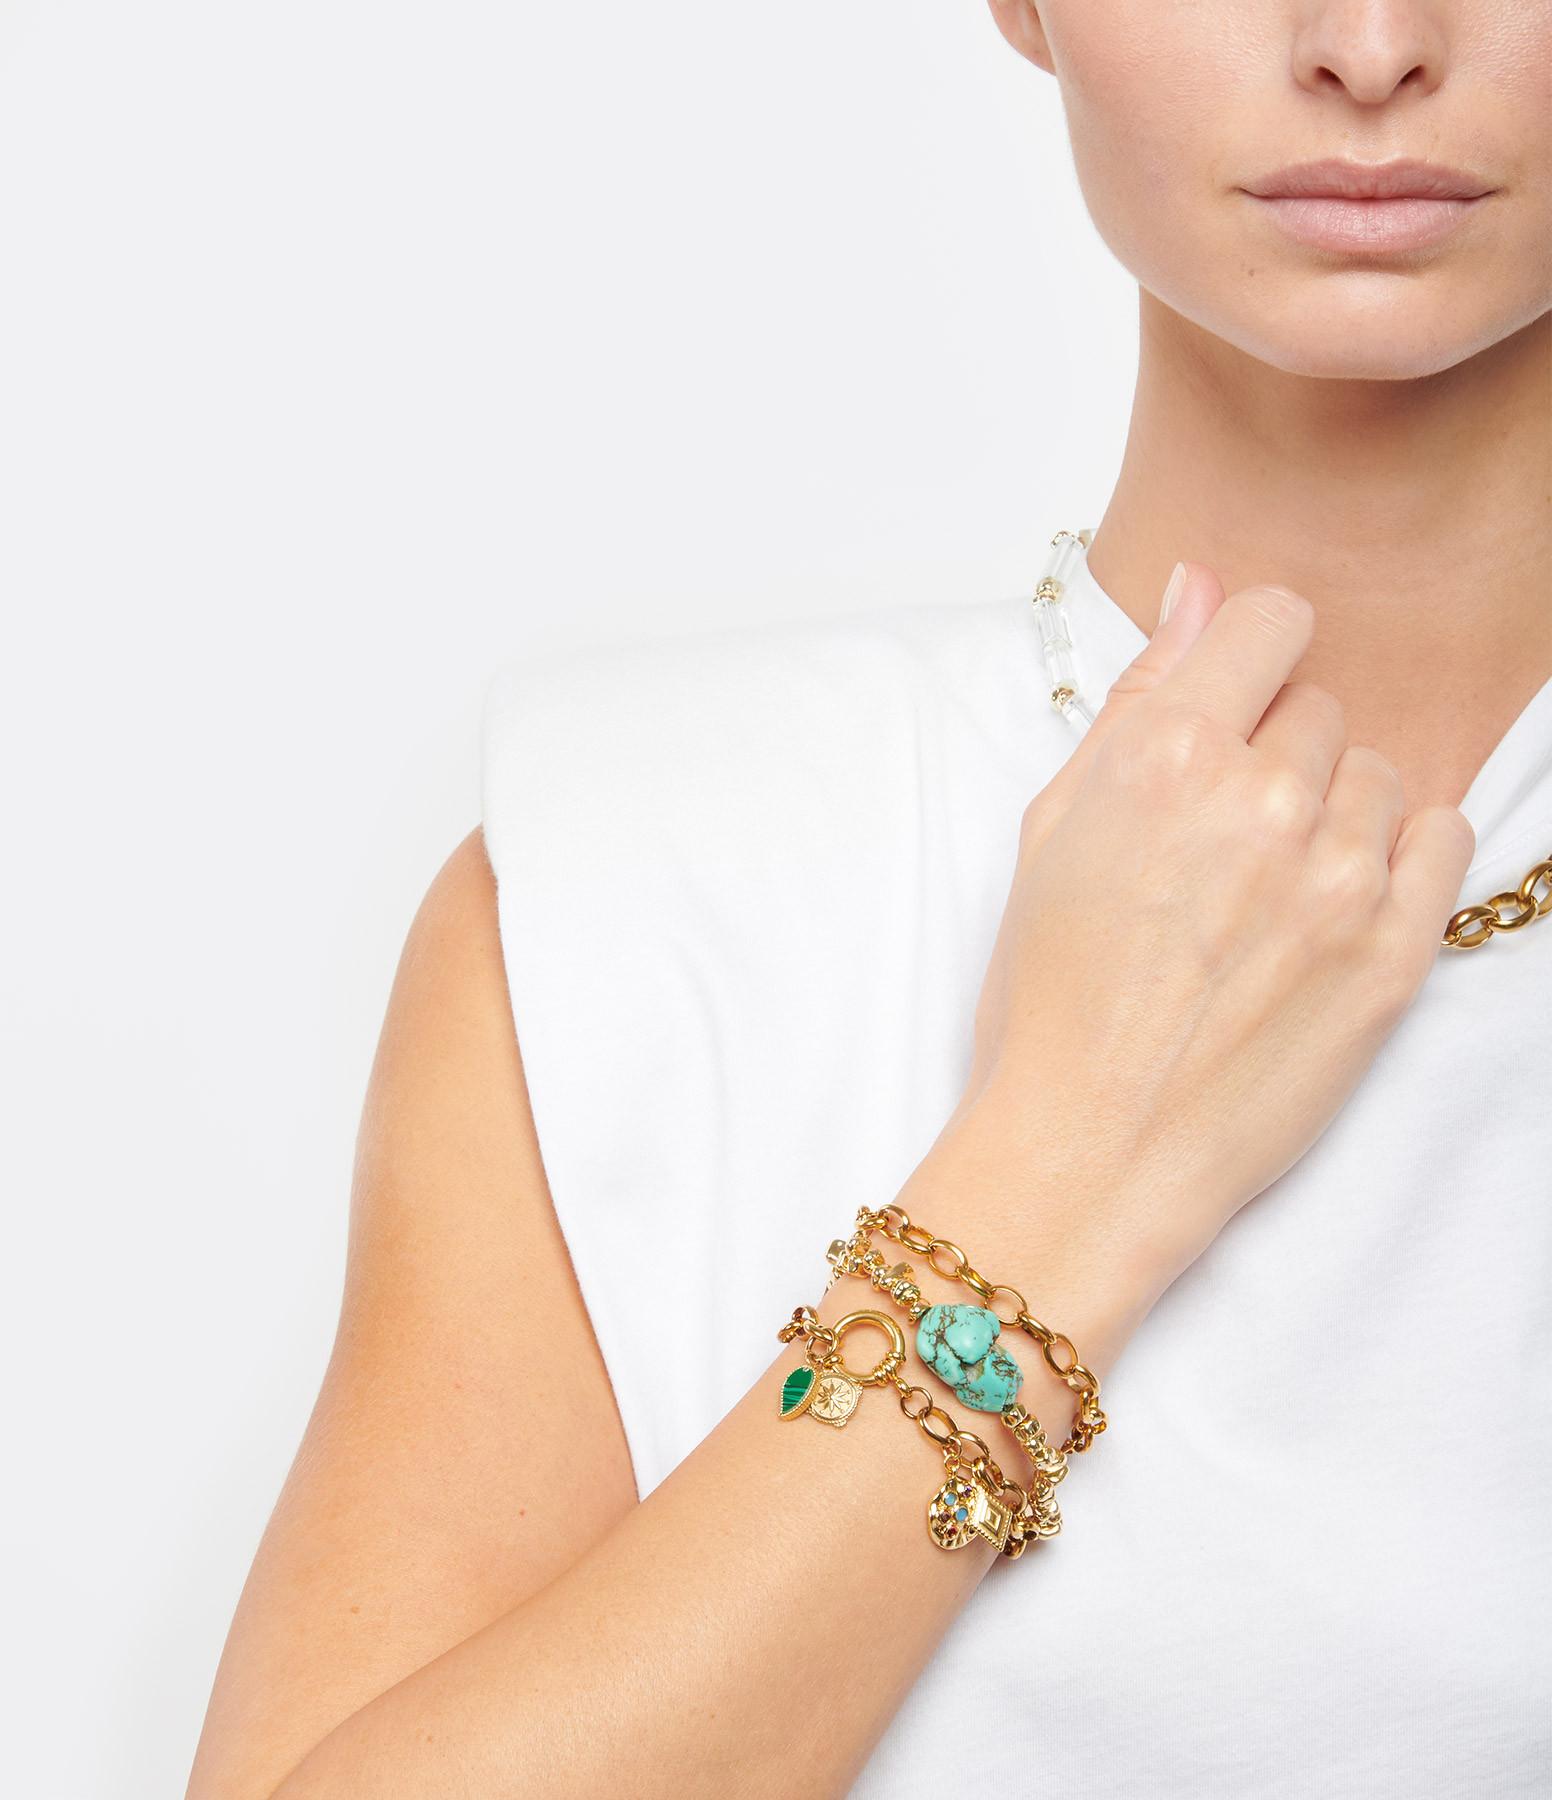 SHAKER JEWELS - Bracelet Espodi Turquoise Hématite Plaqué Or